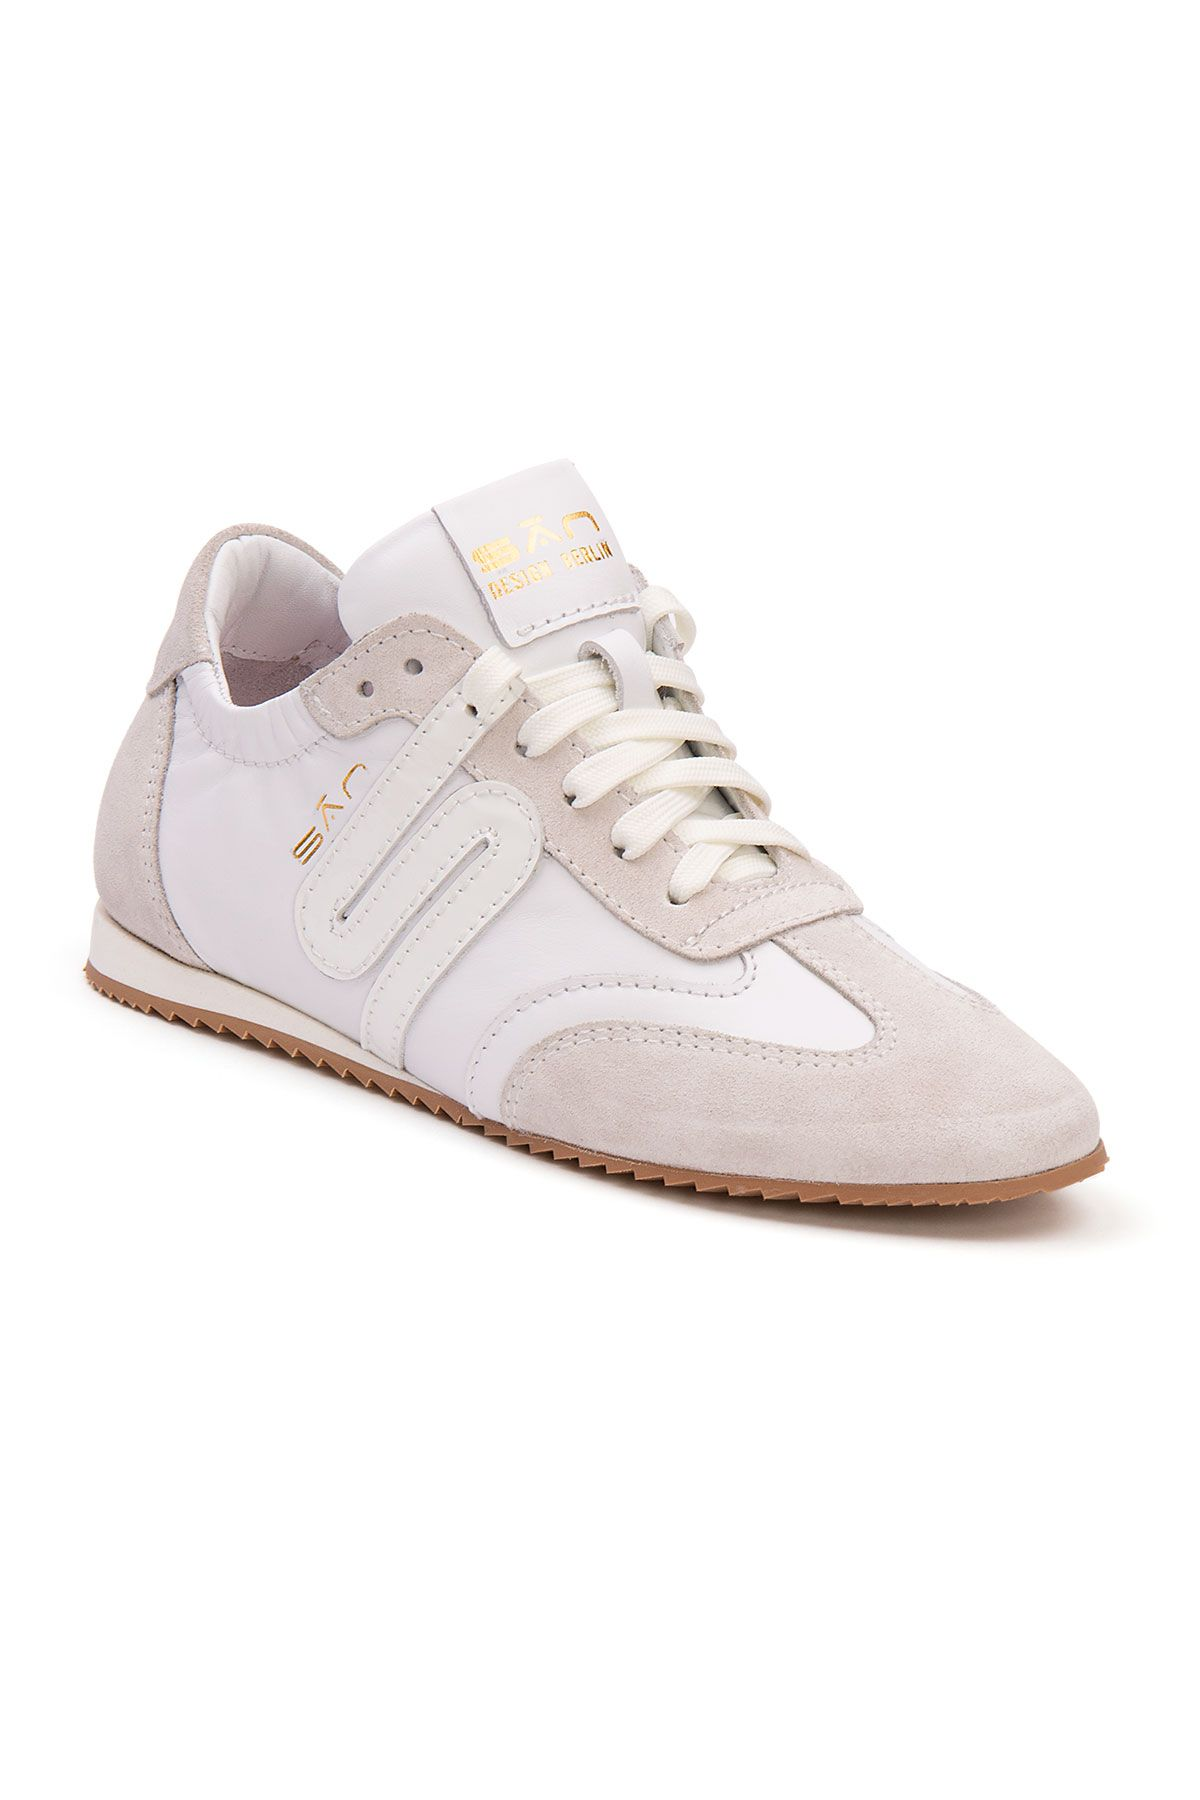 San Women's Leather Sneakers SAN05S White